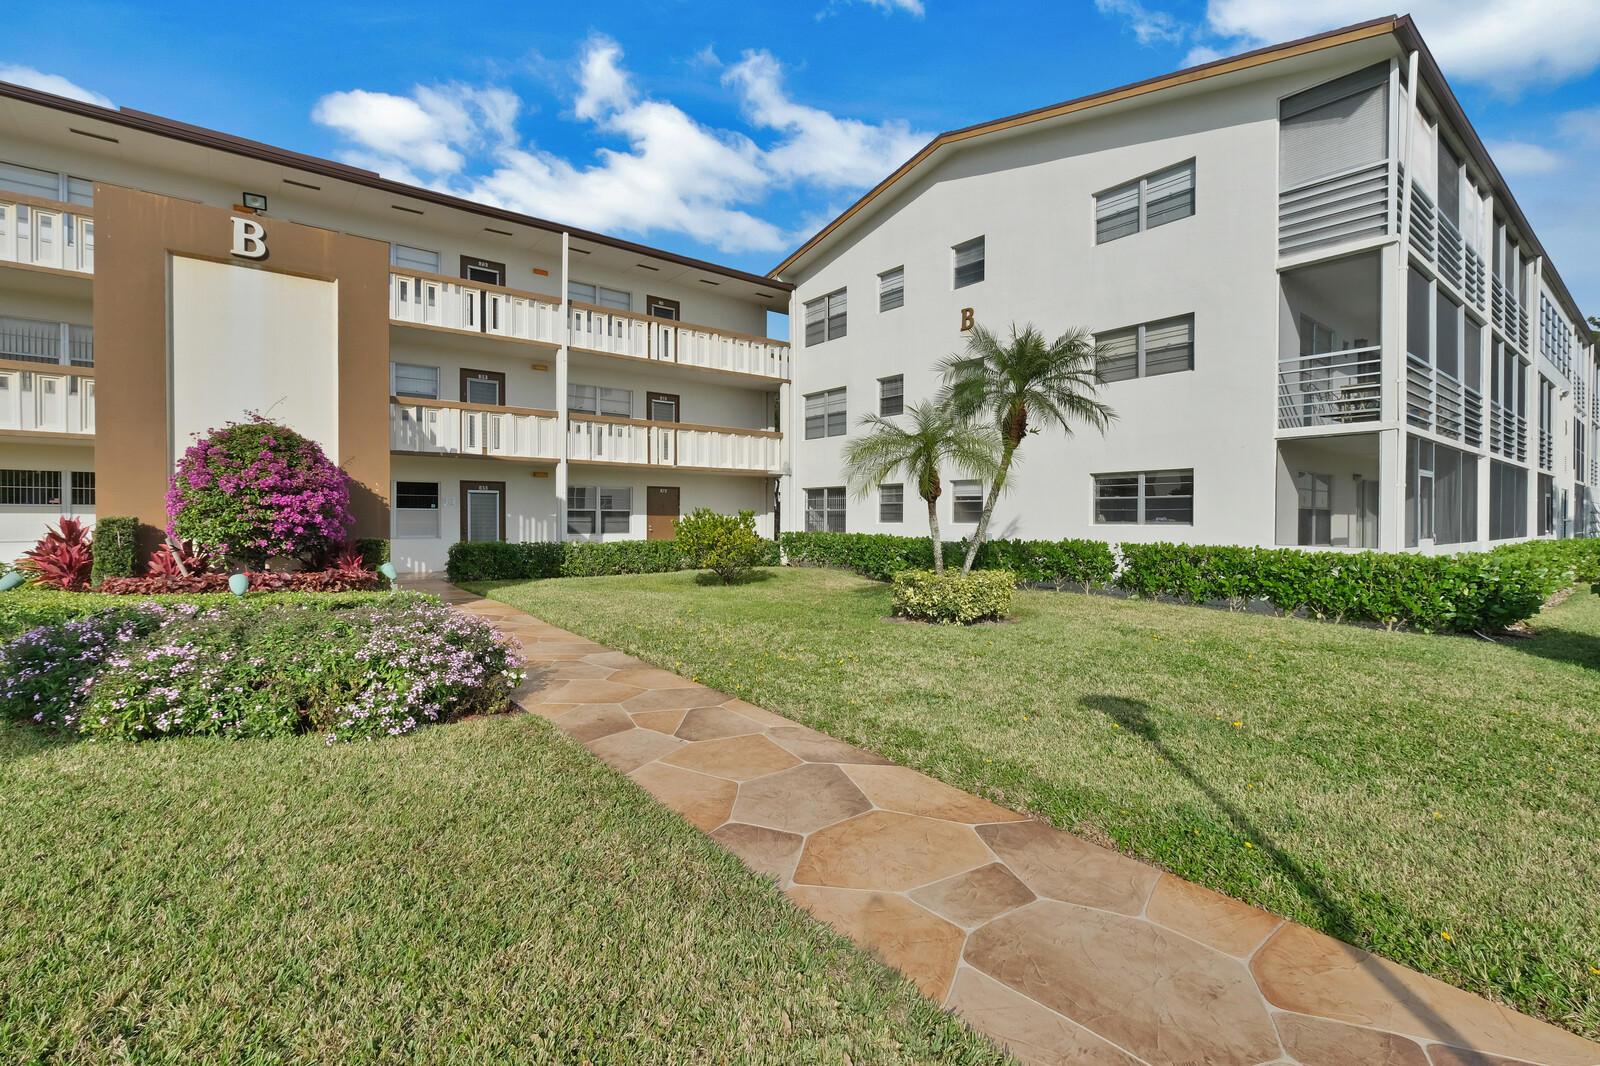 47 Mansfield B, Boca Raton, FL, 33434